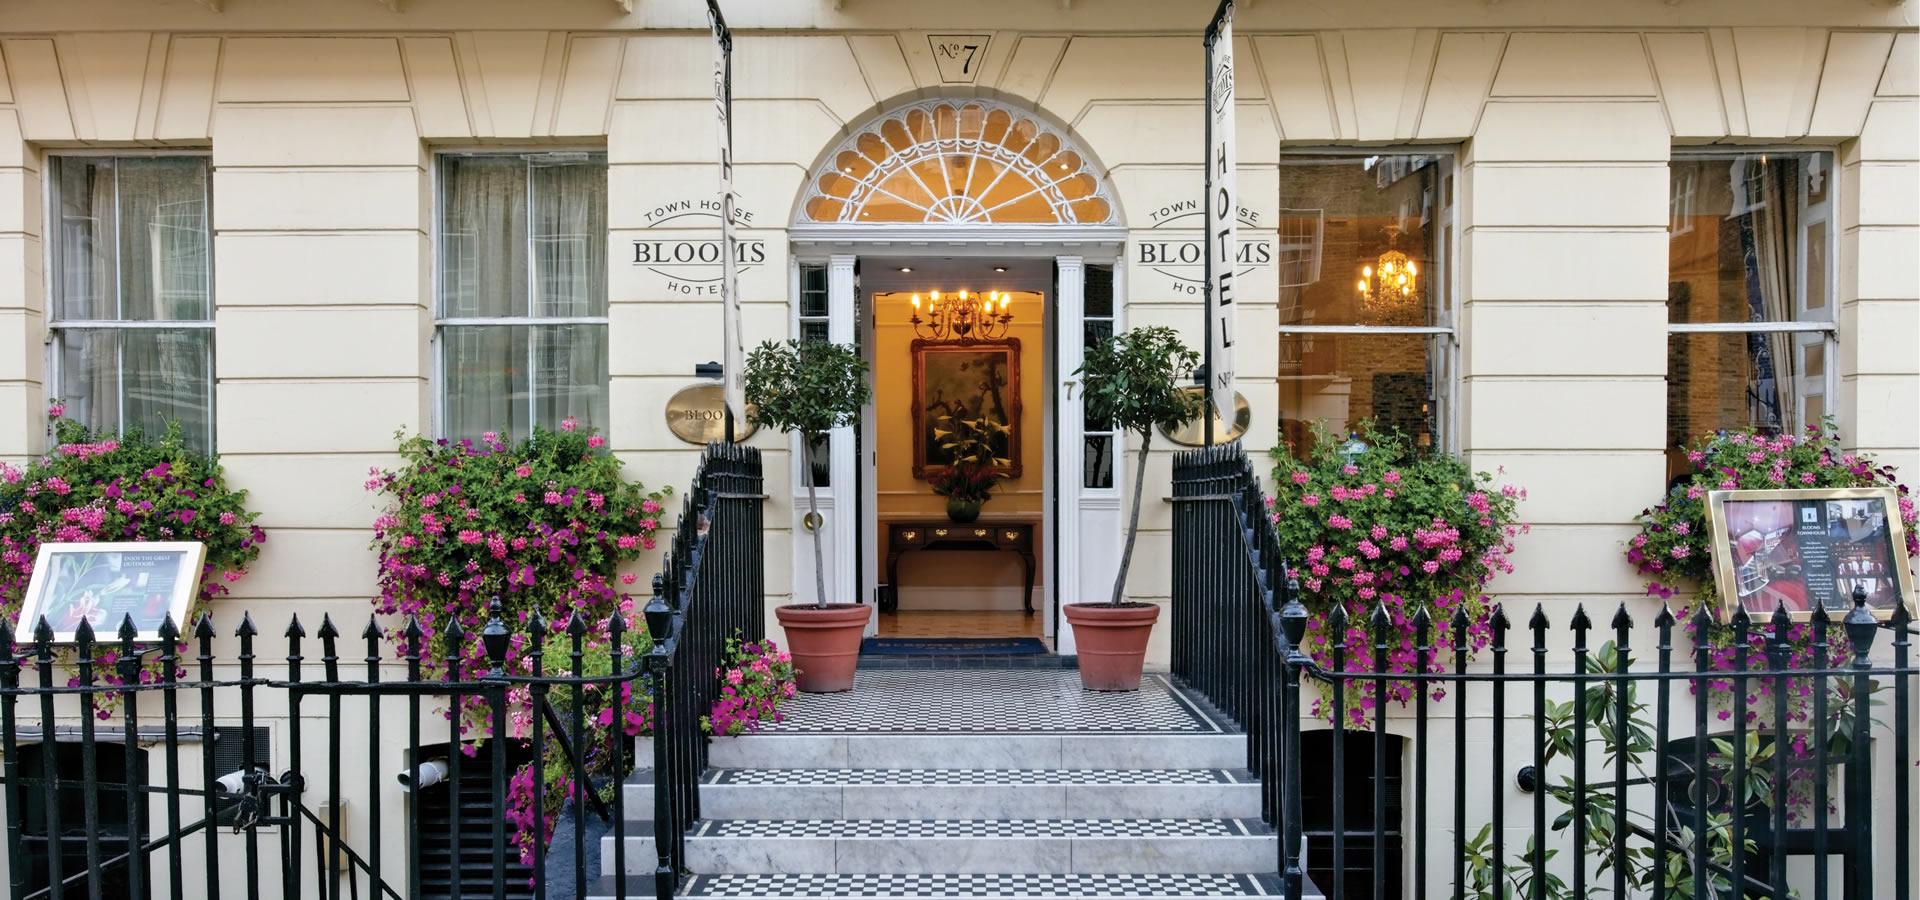 Grange City Hotel $116 ($̶1̶9̶6̶) - UPDATED 2018 Prices